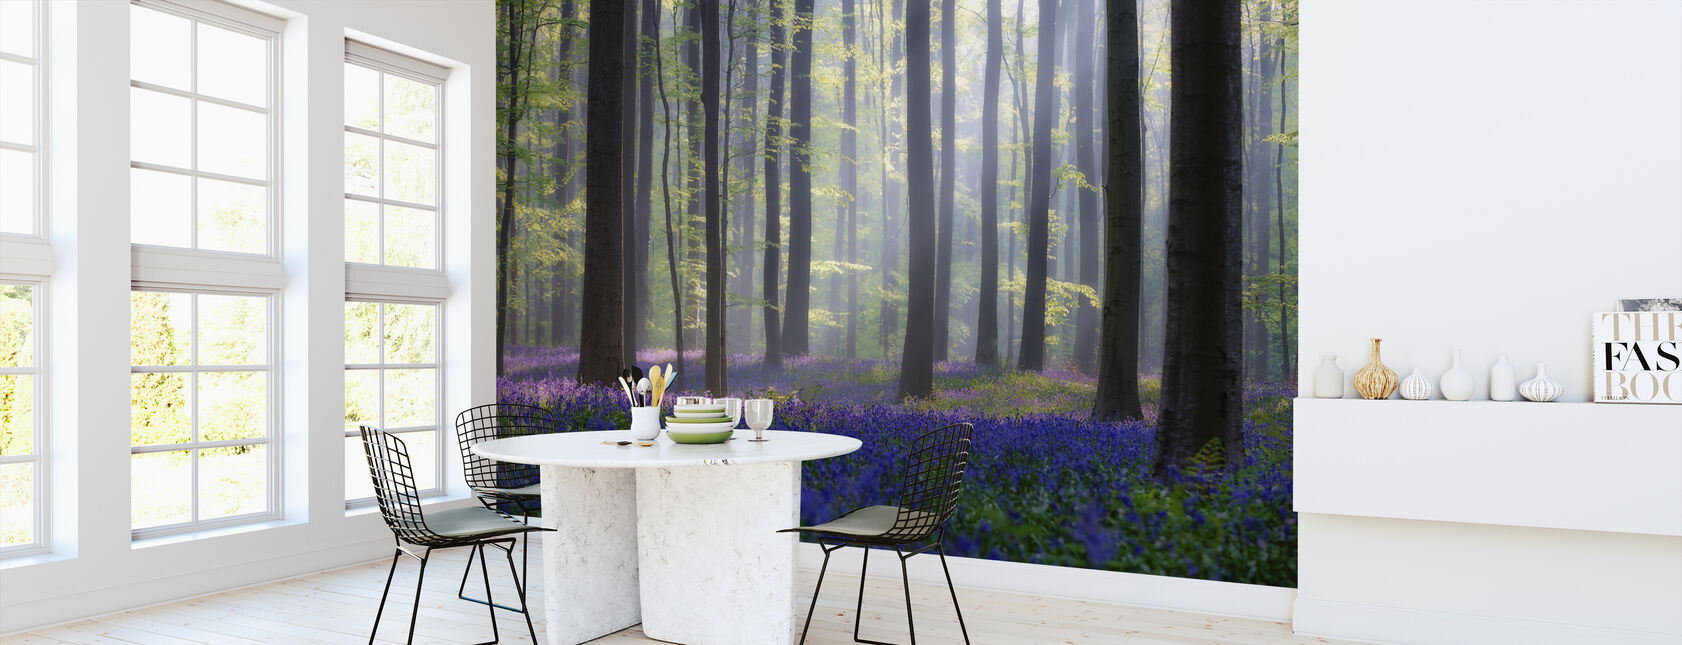 Bluebells - Wallpaper - Kitchen